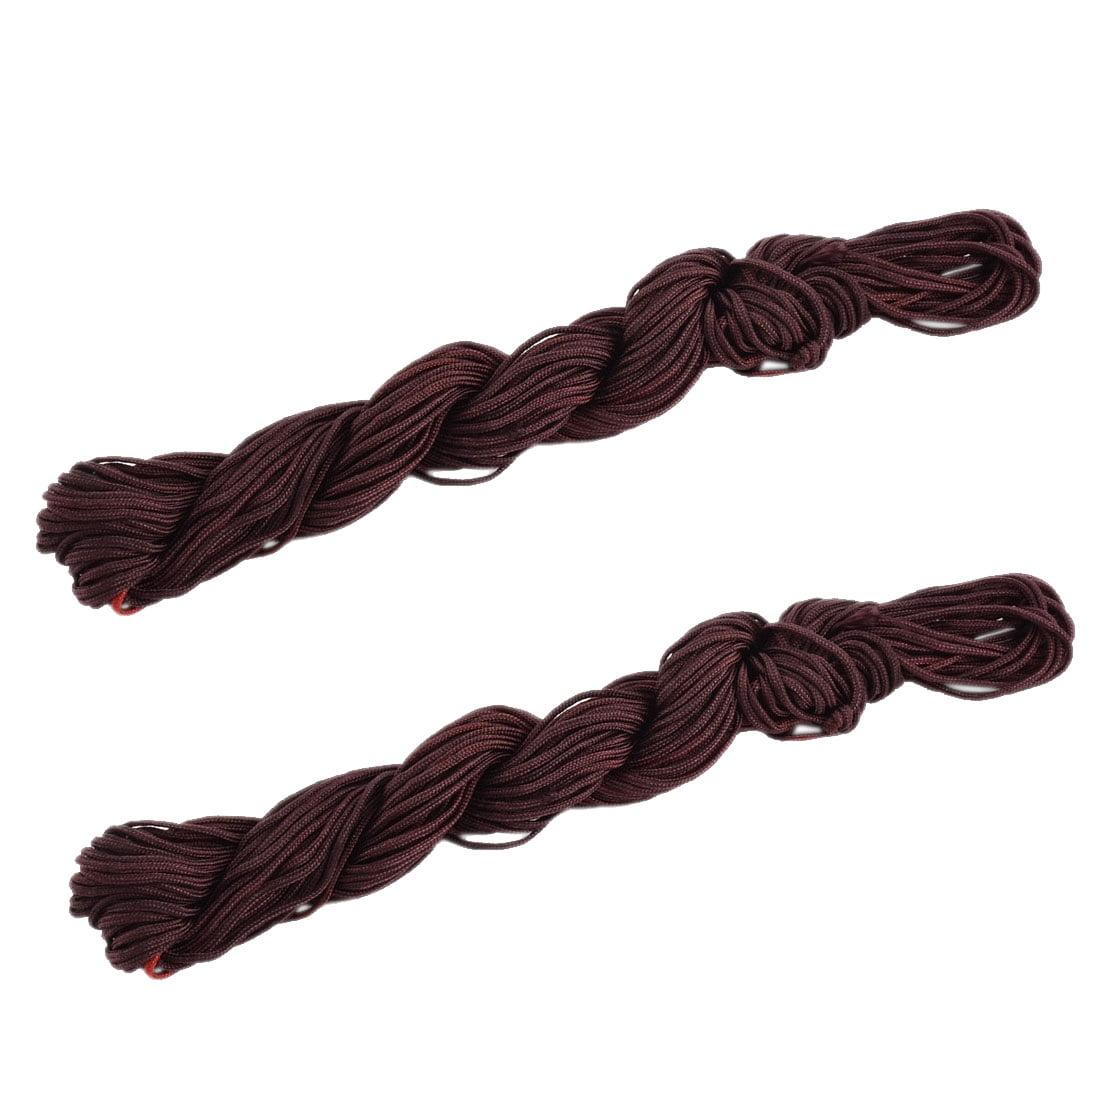 Nylon DIY Handmade Craft Chinese Knot Beading Line String Burgundy 22 Yards 2pcs